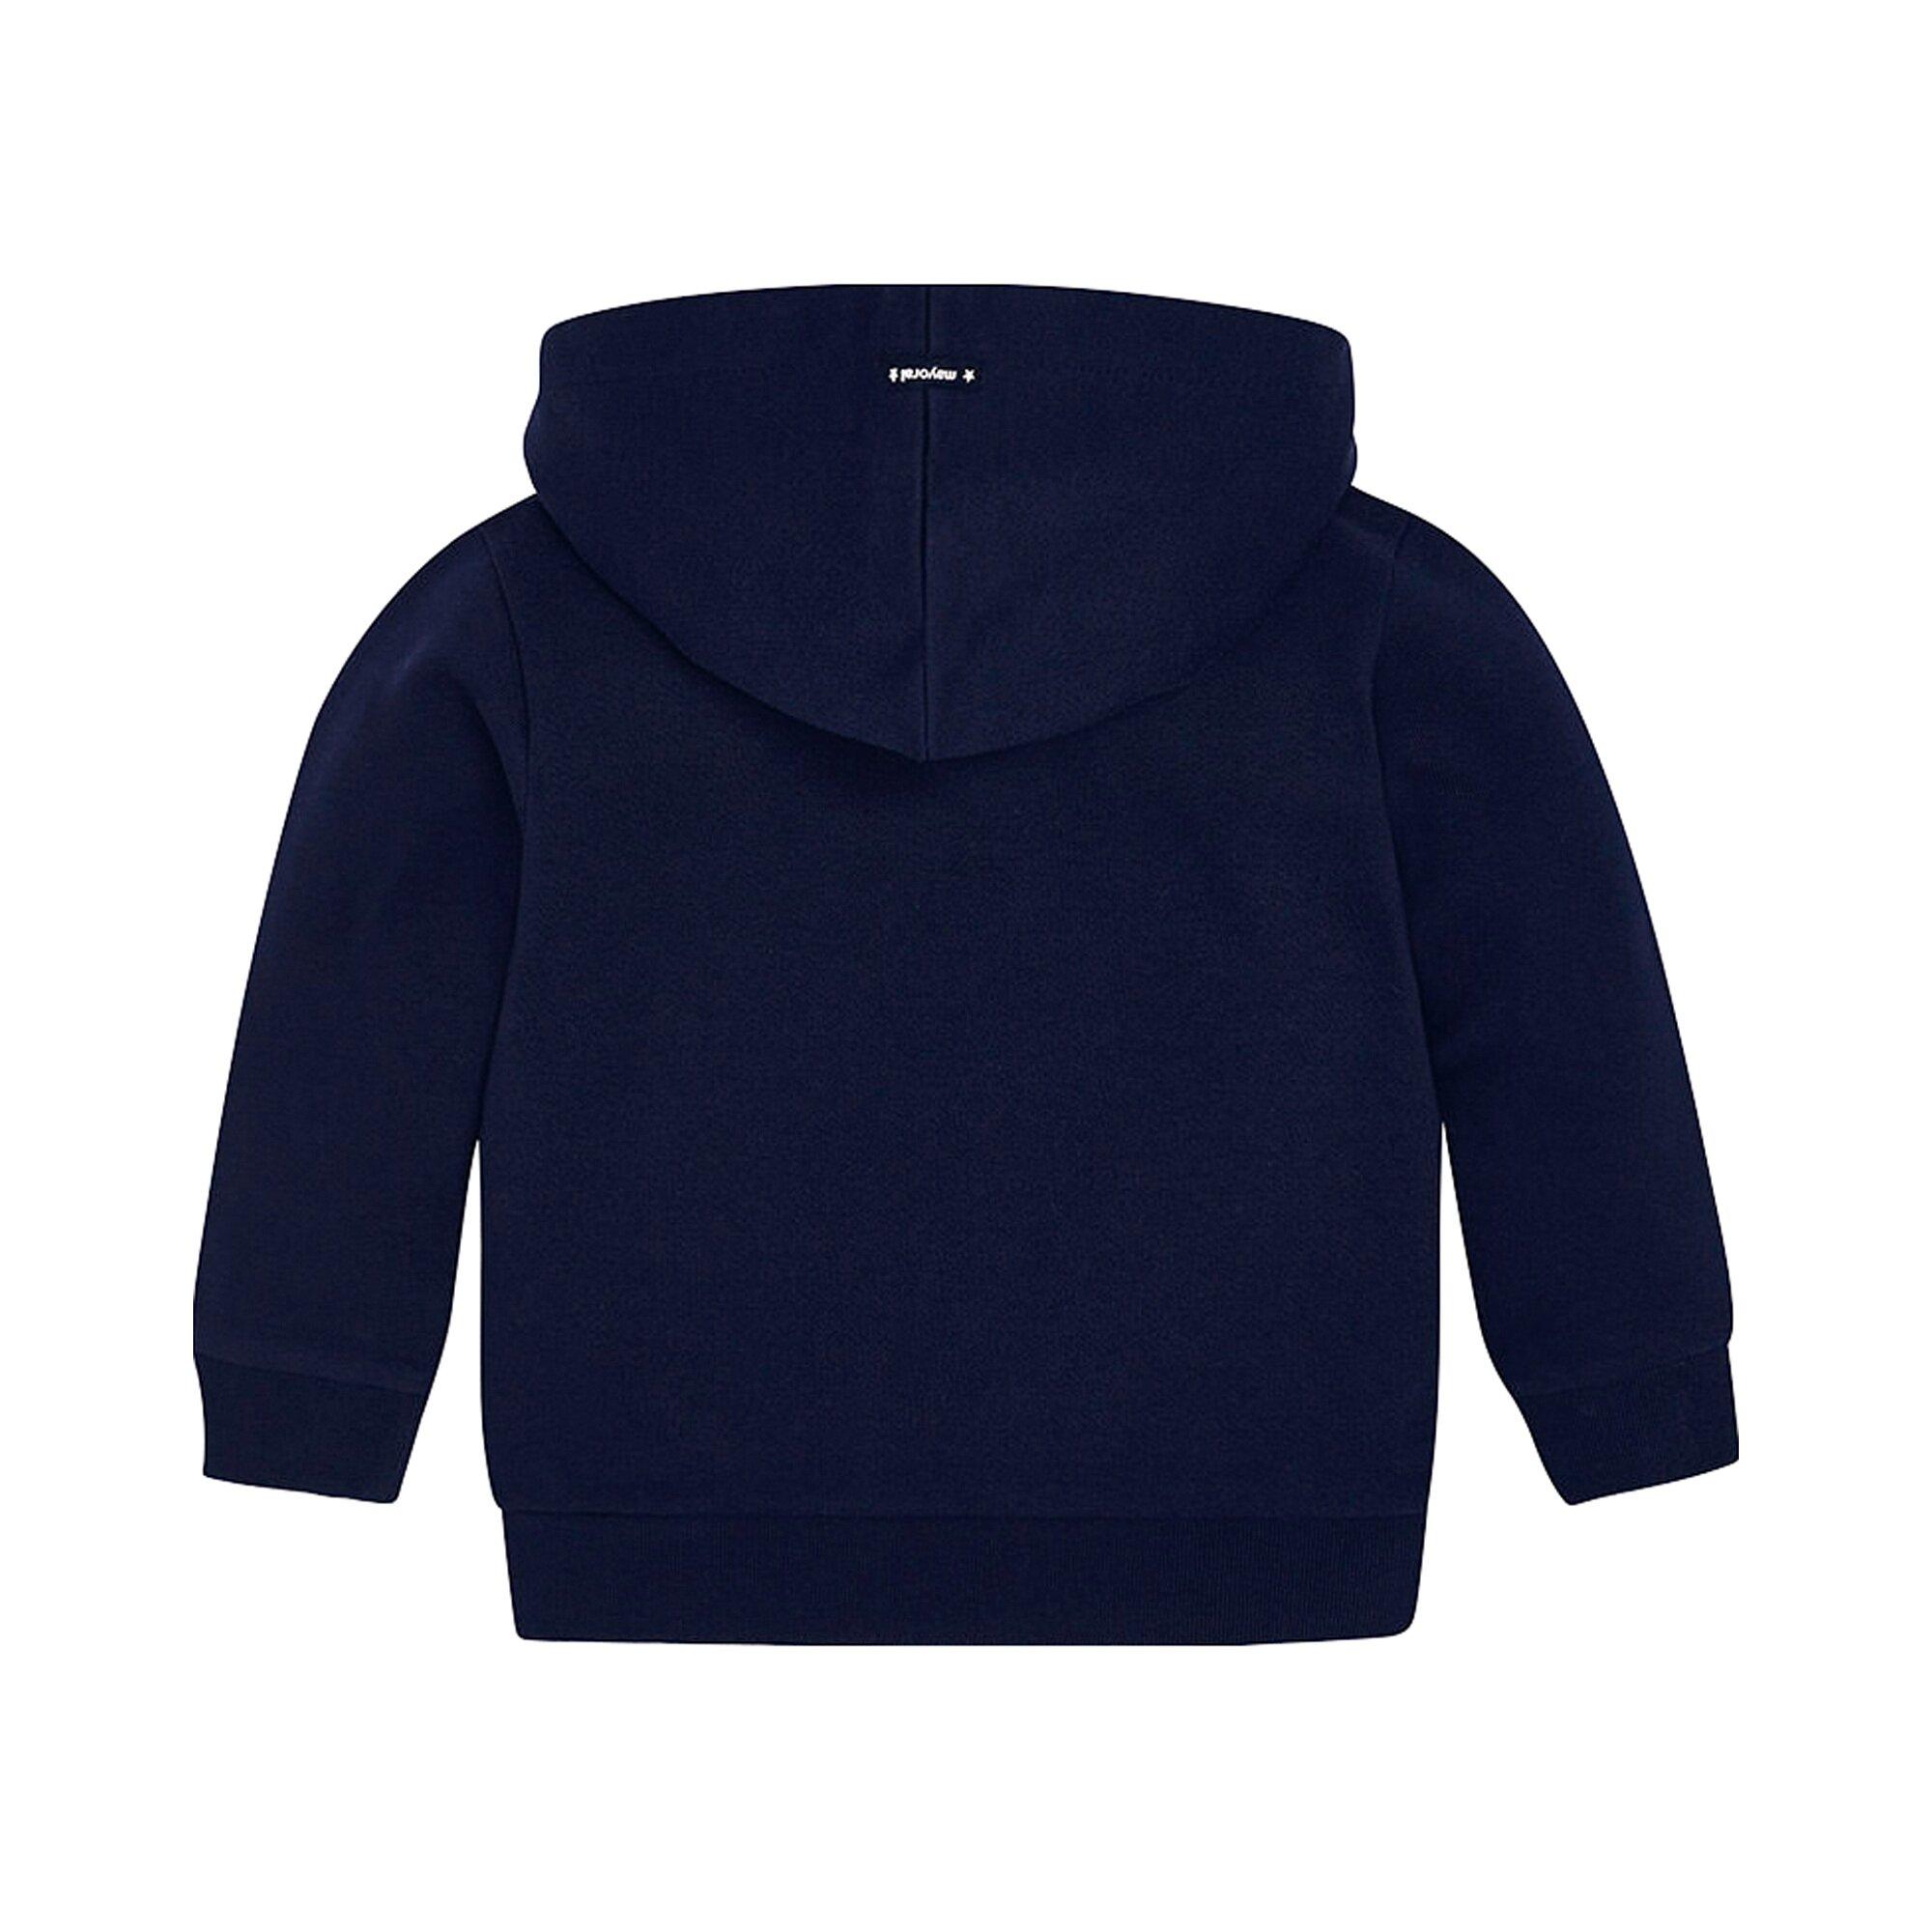 mayoral-sweatshirt-rennauto